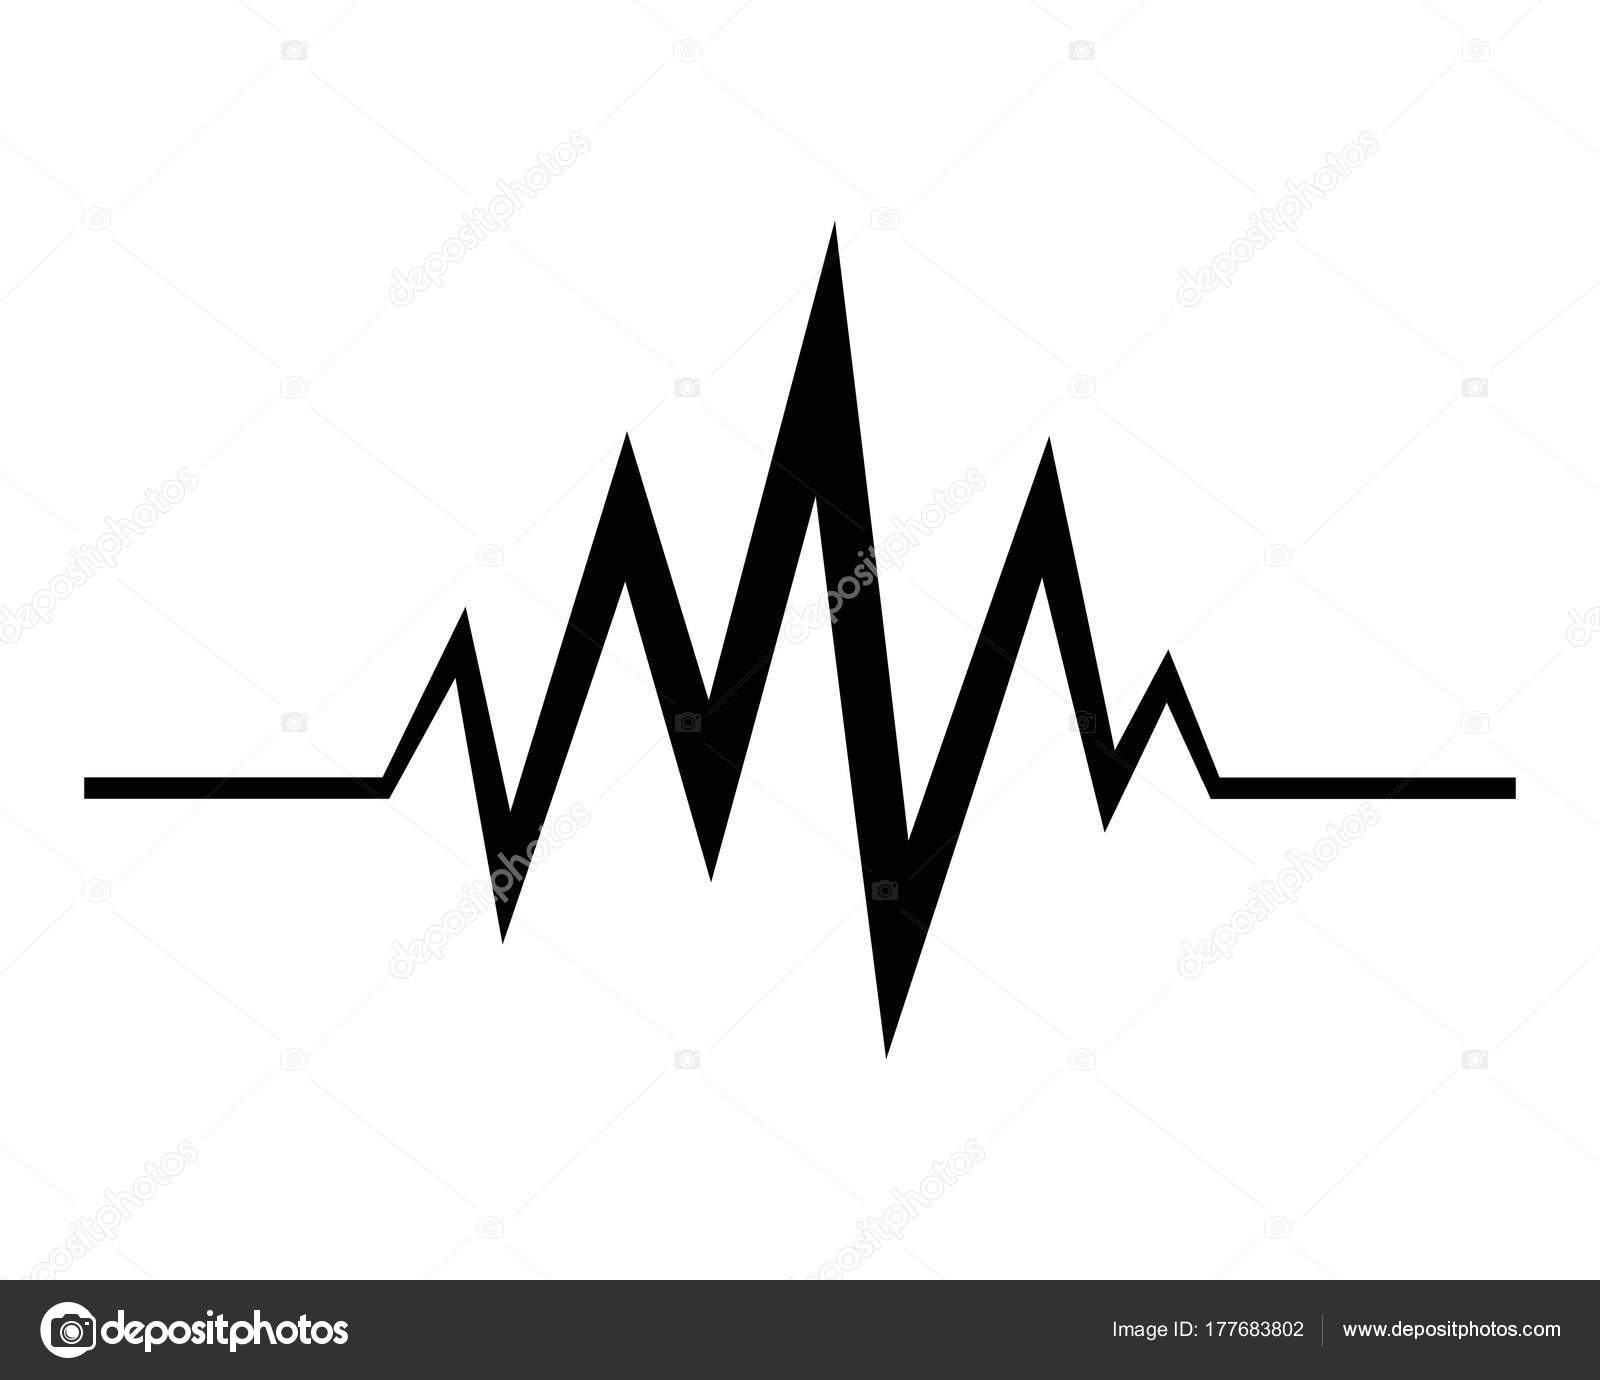 music sound waves vector icon illustration stock vector elaelo rh depositphotos com